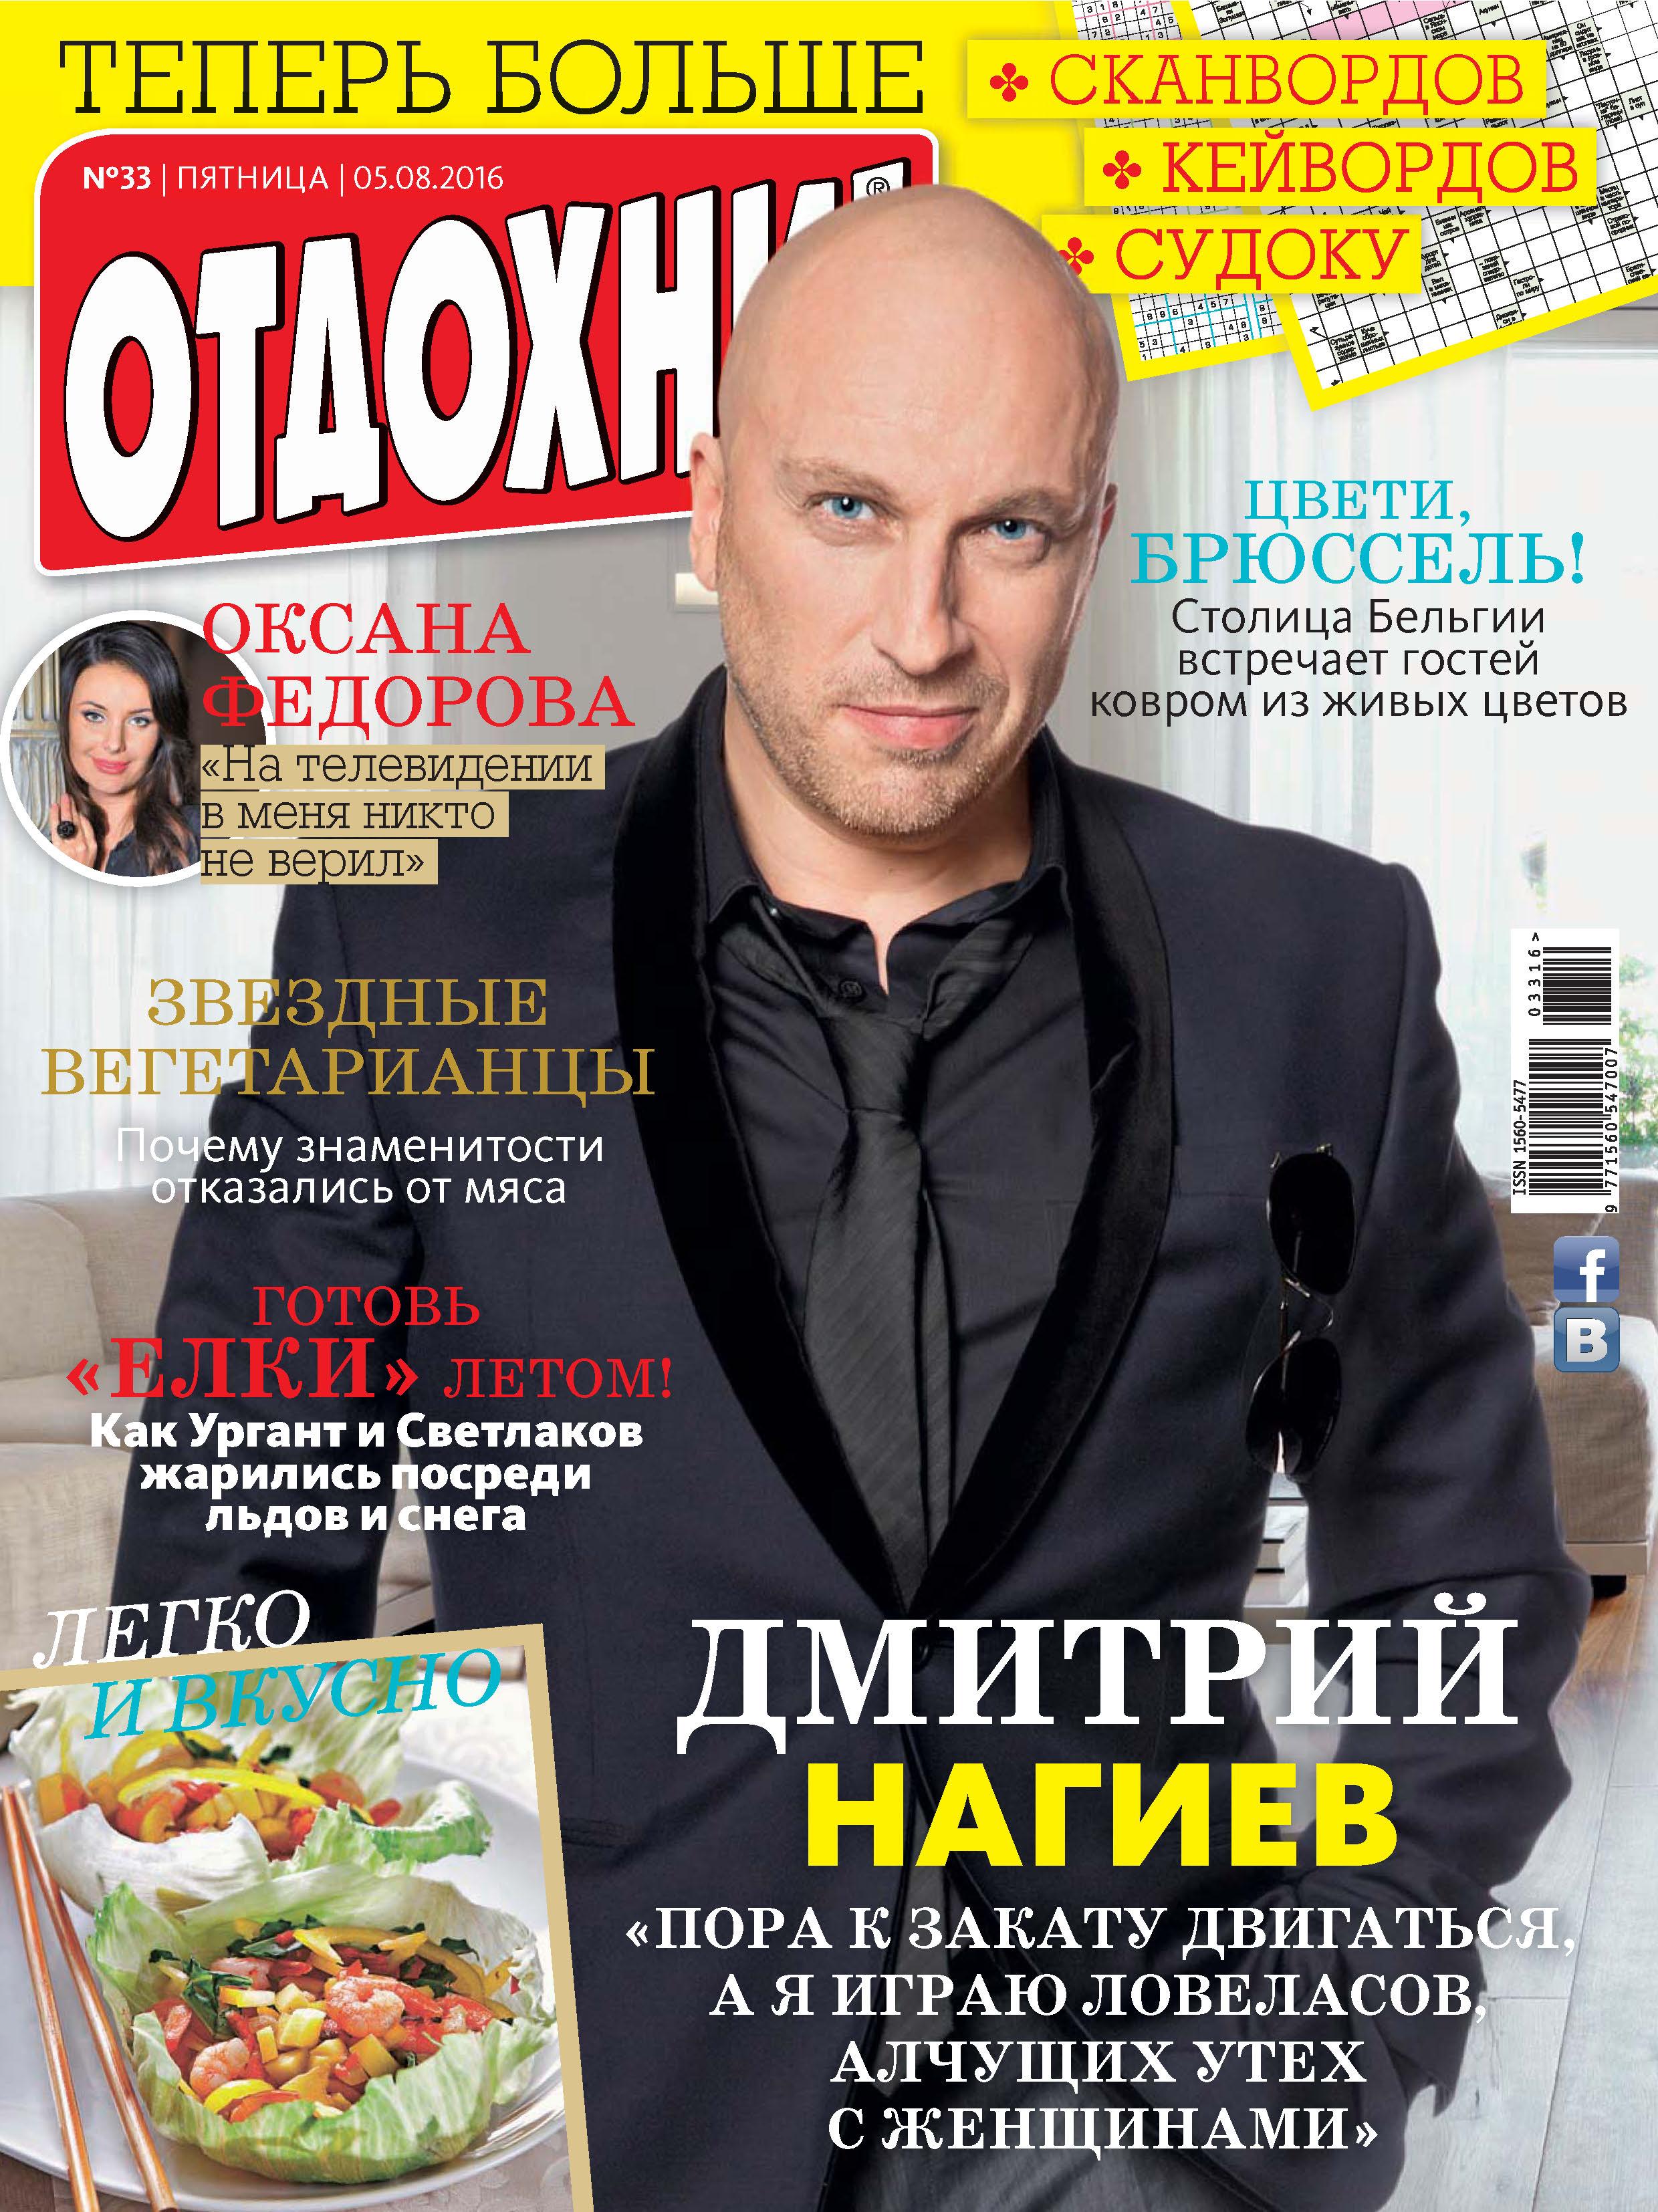 ИД «Бурда» Журнал «Отдохни!» №33/2016 ид бурда журнал лиза 33 2016